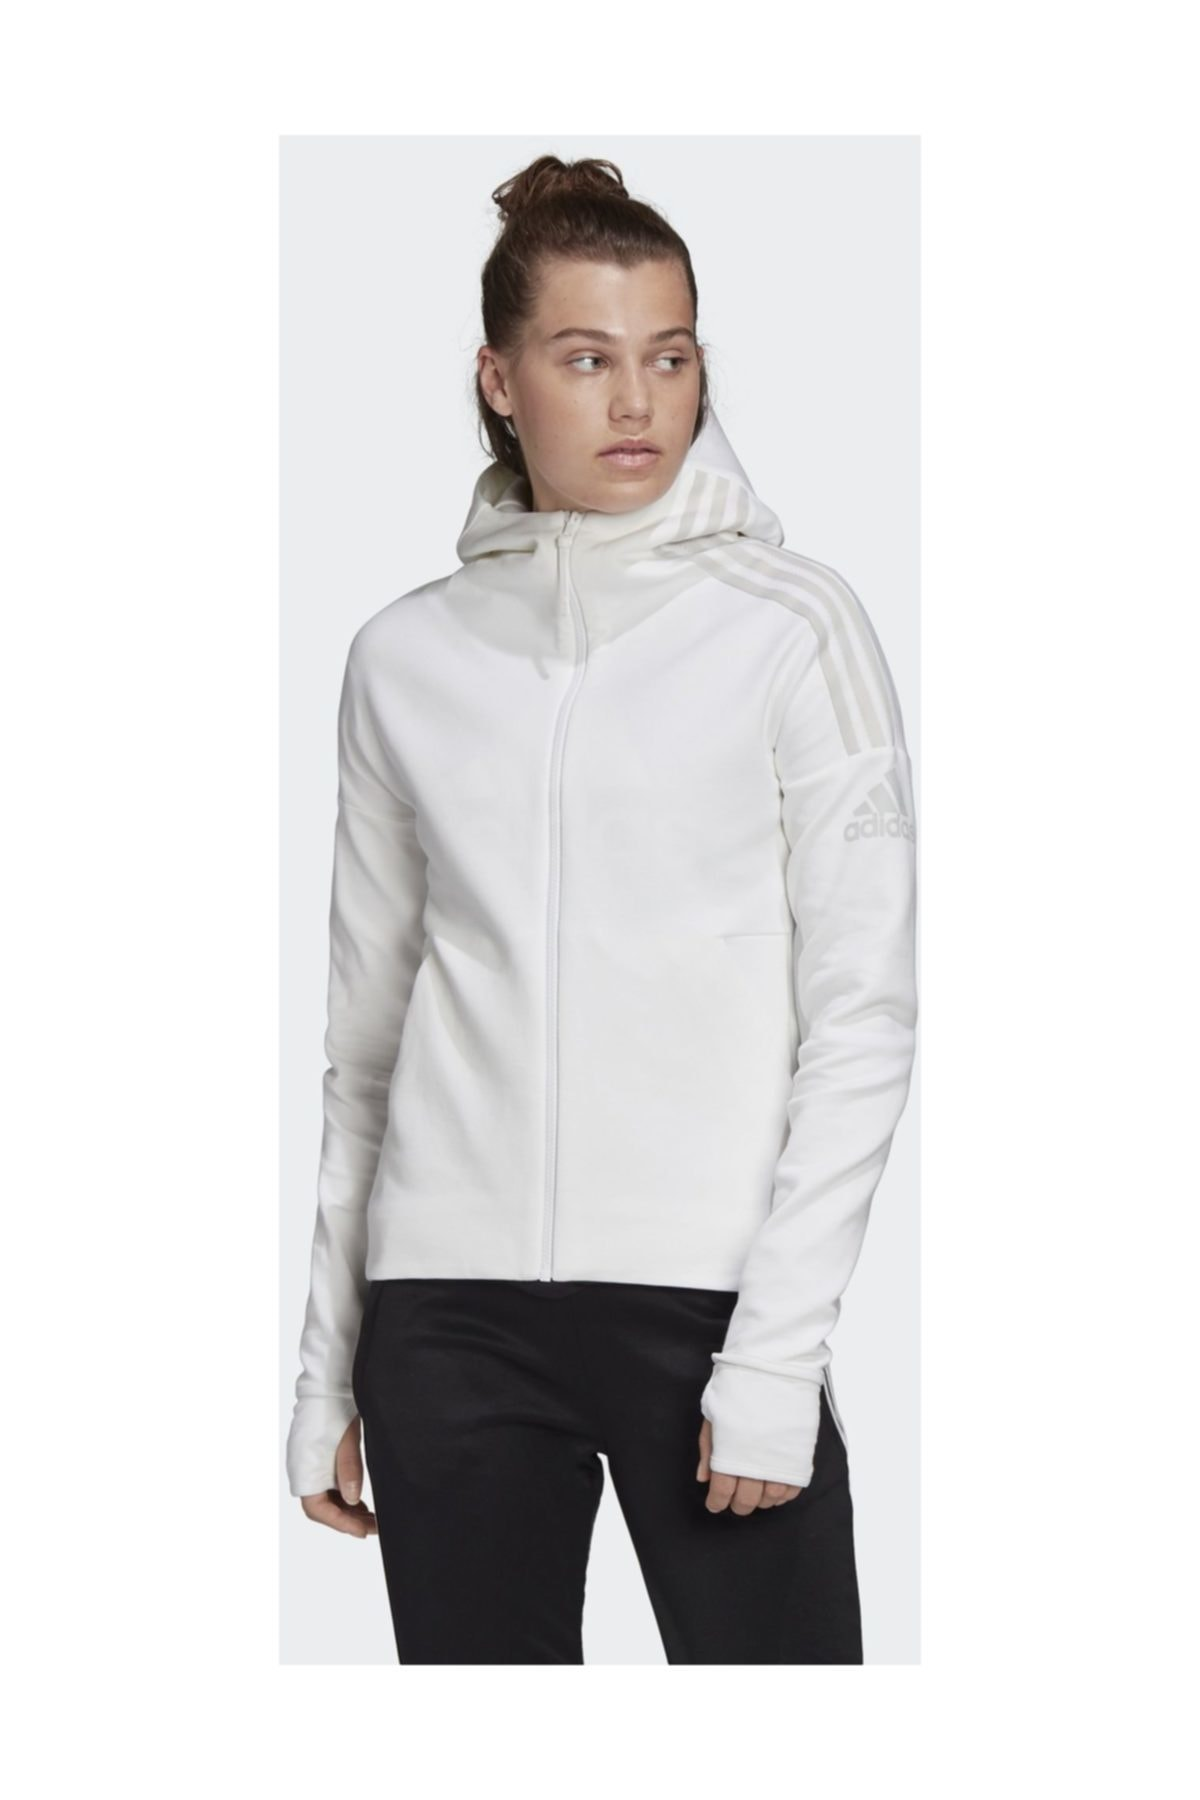 adidas Z.n.e. Hoodie Kadın Sweatshirt 1